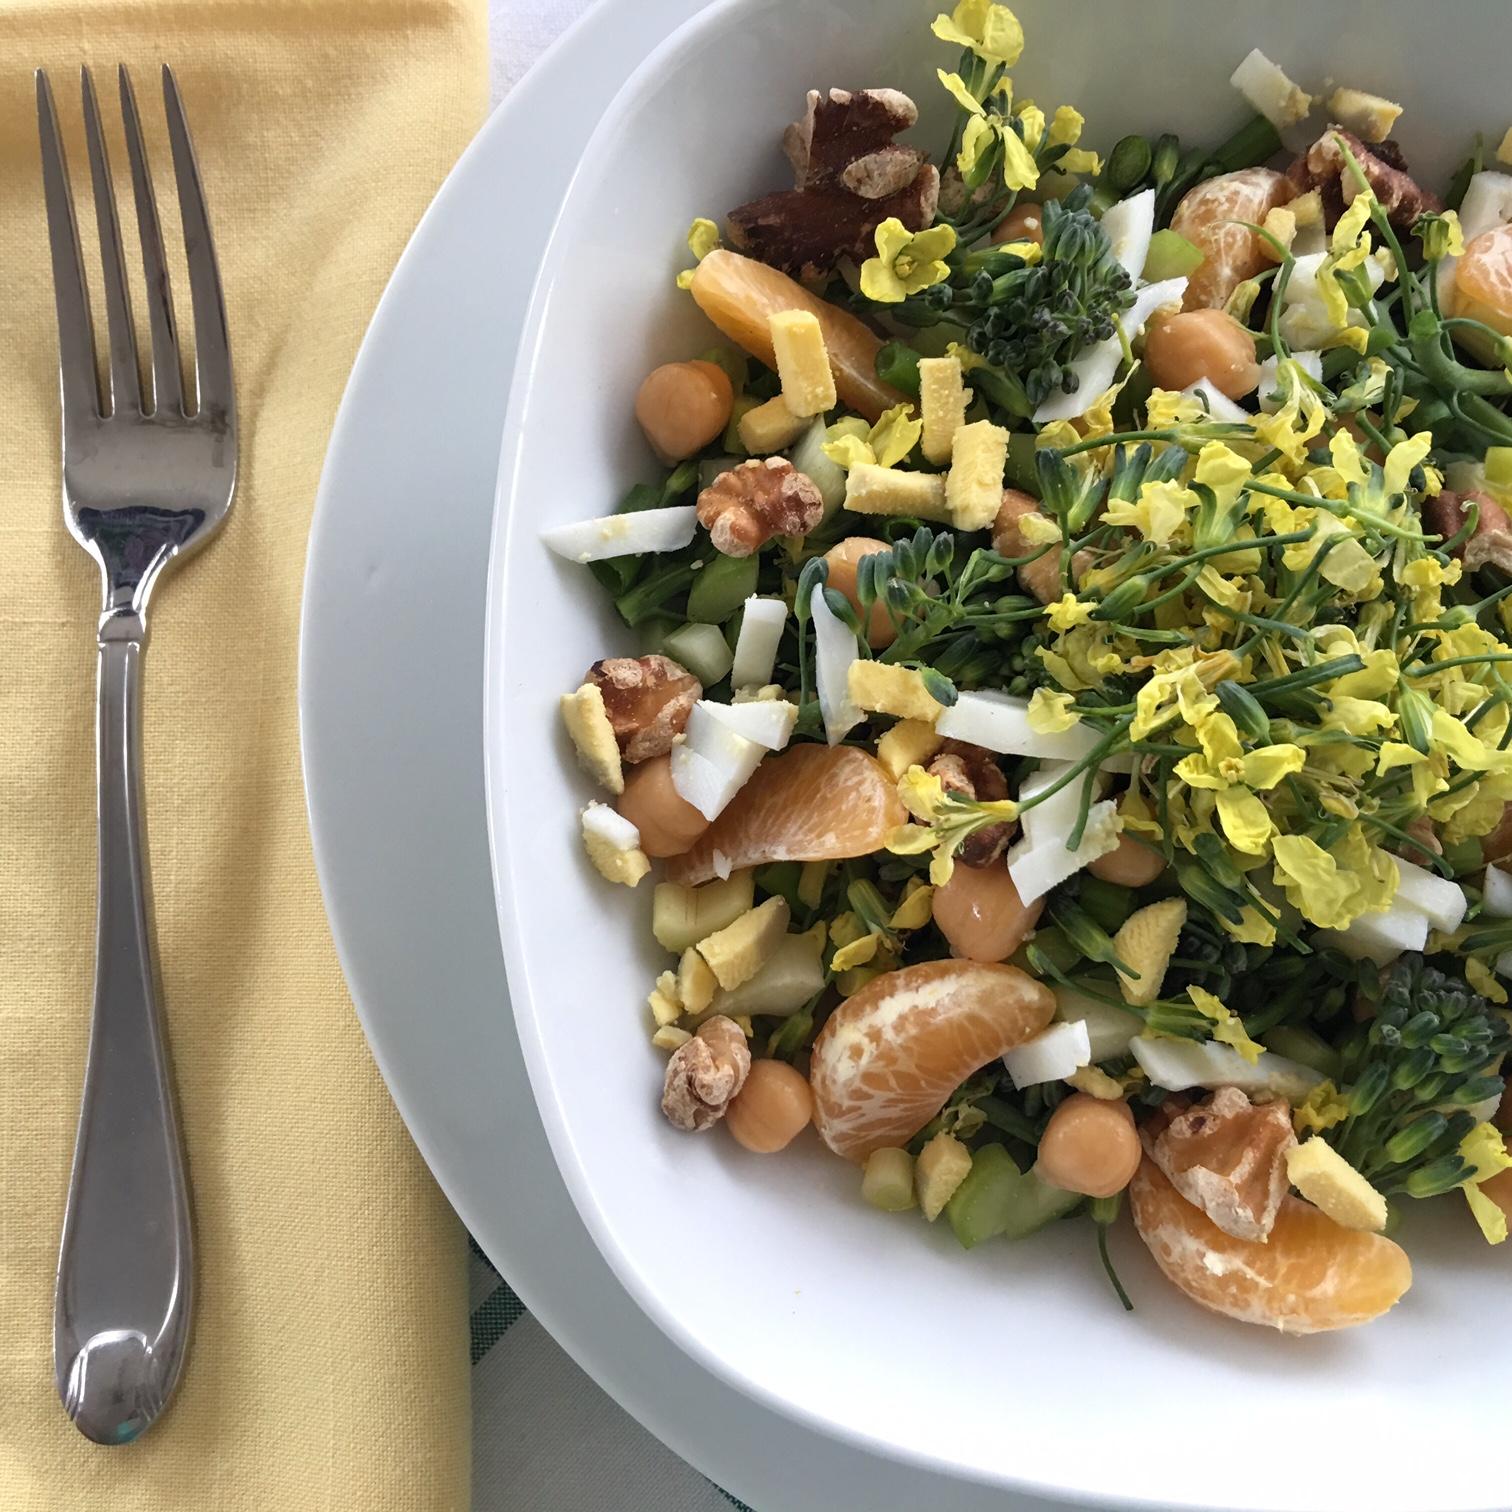 To Market To Market With San Diego Foodstuff Broccoli Flower Salad